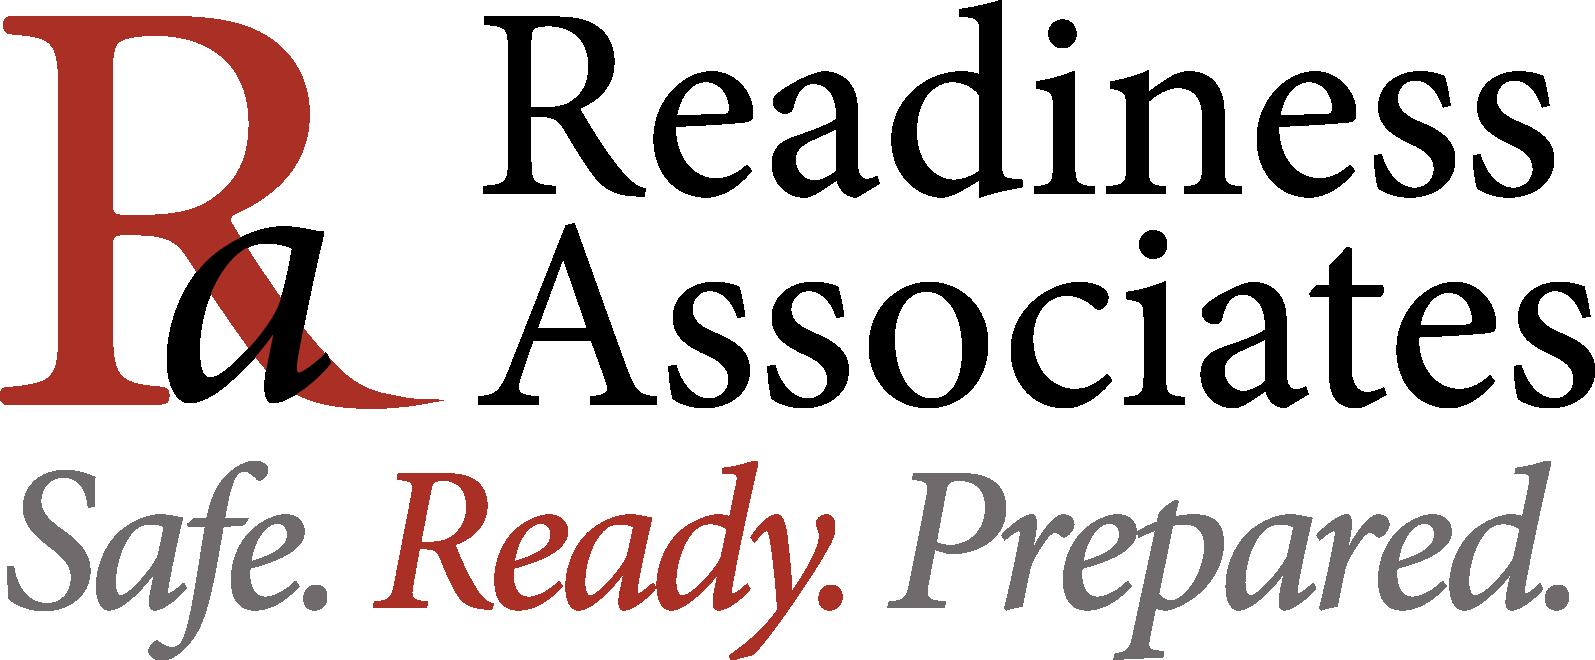 ReadinessAssociates Logo